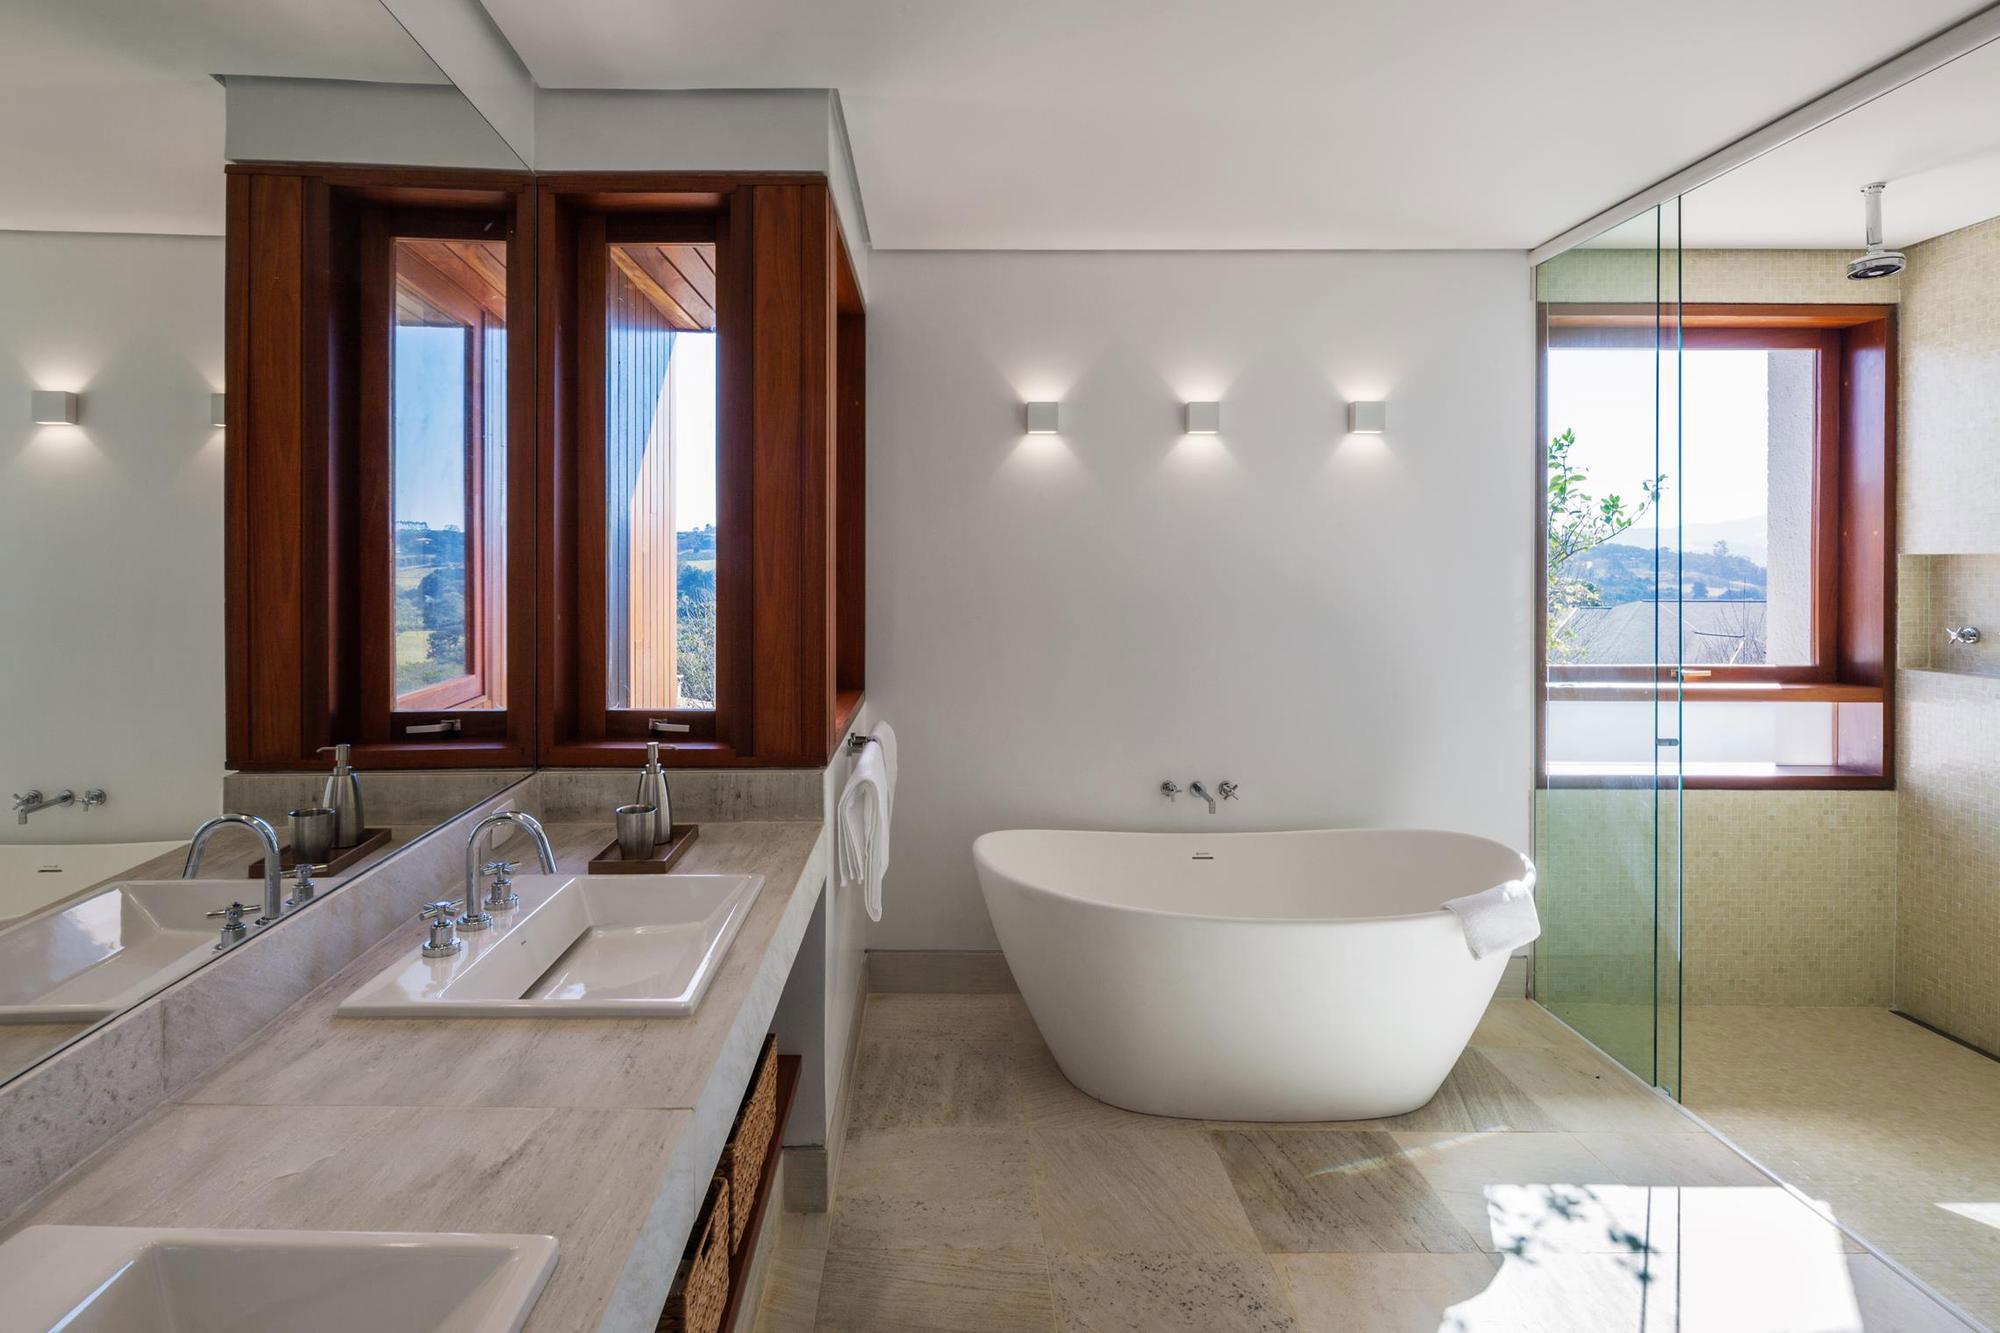 FT Modern Holiday and Weekend House by Reinach Mendonça Arquitetos Associados-12